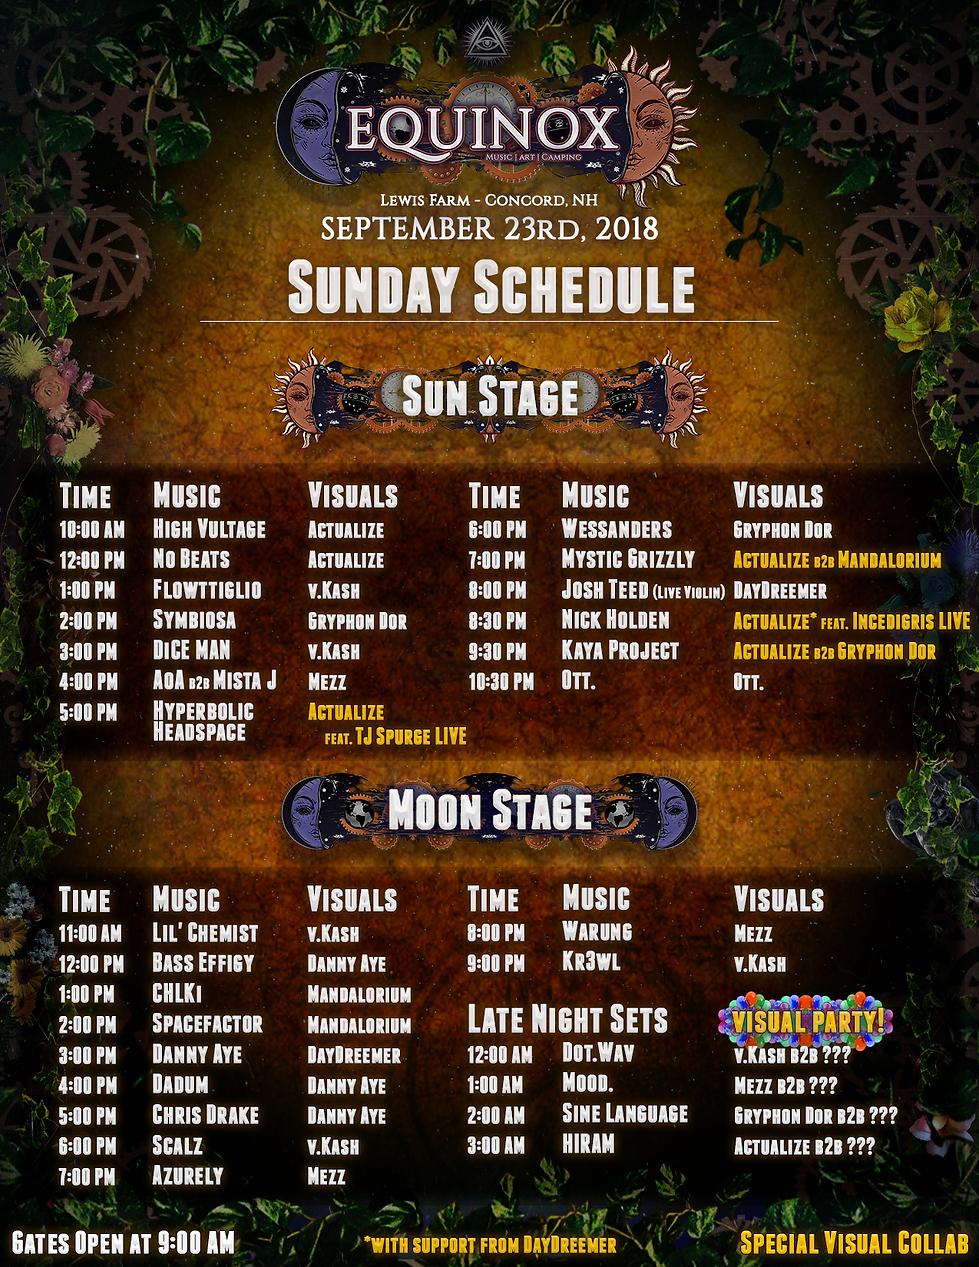 Equinox-Sunday-Schedule.png